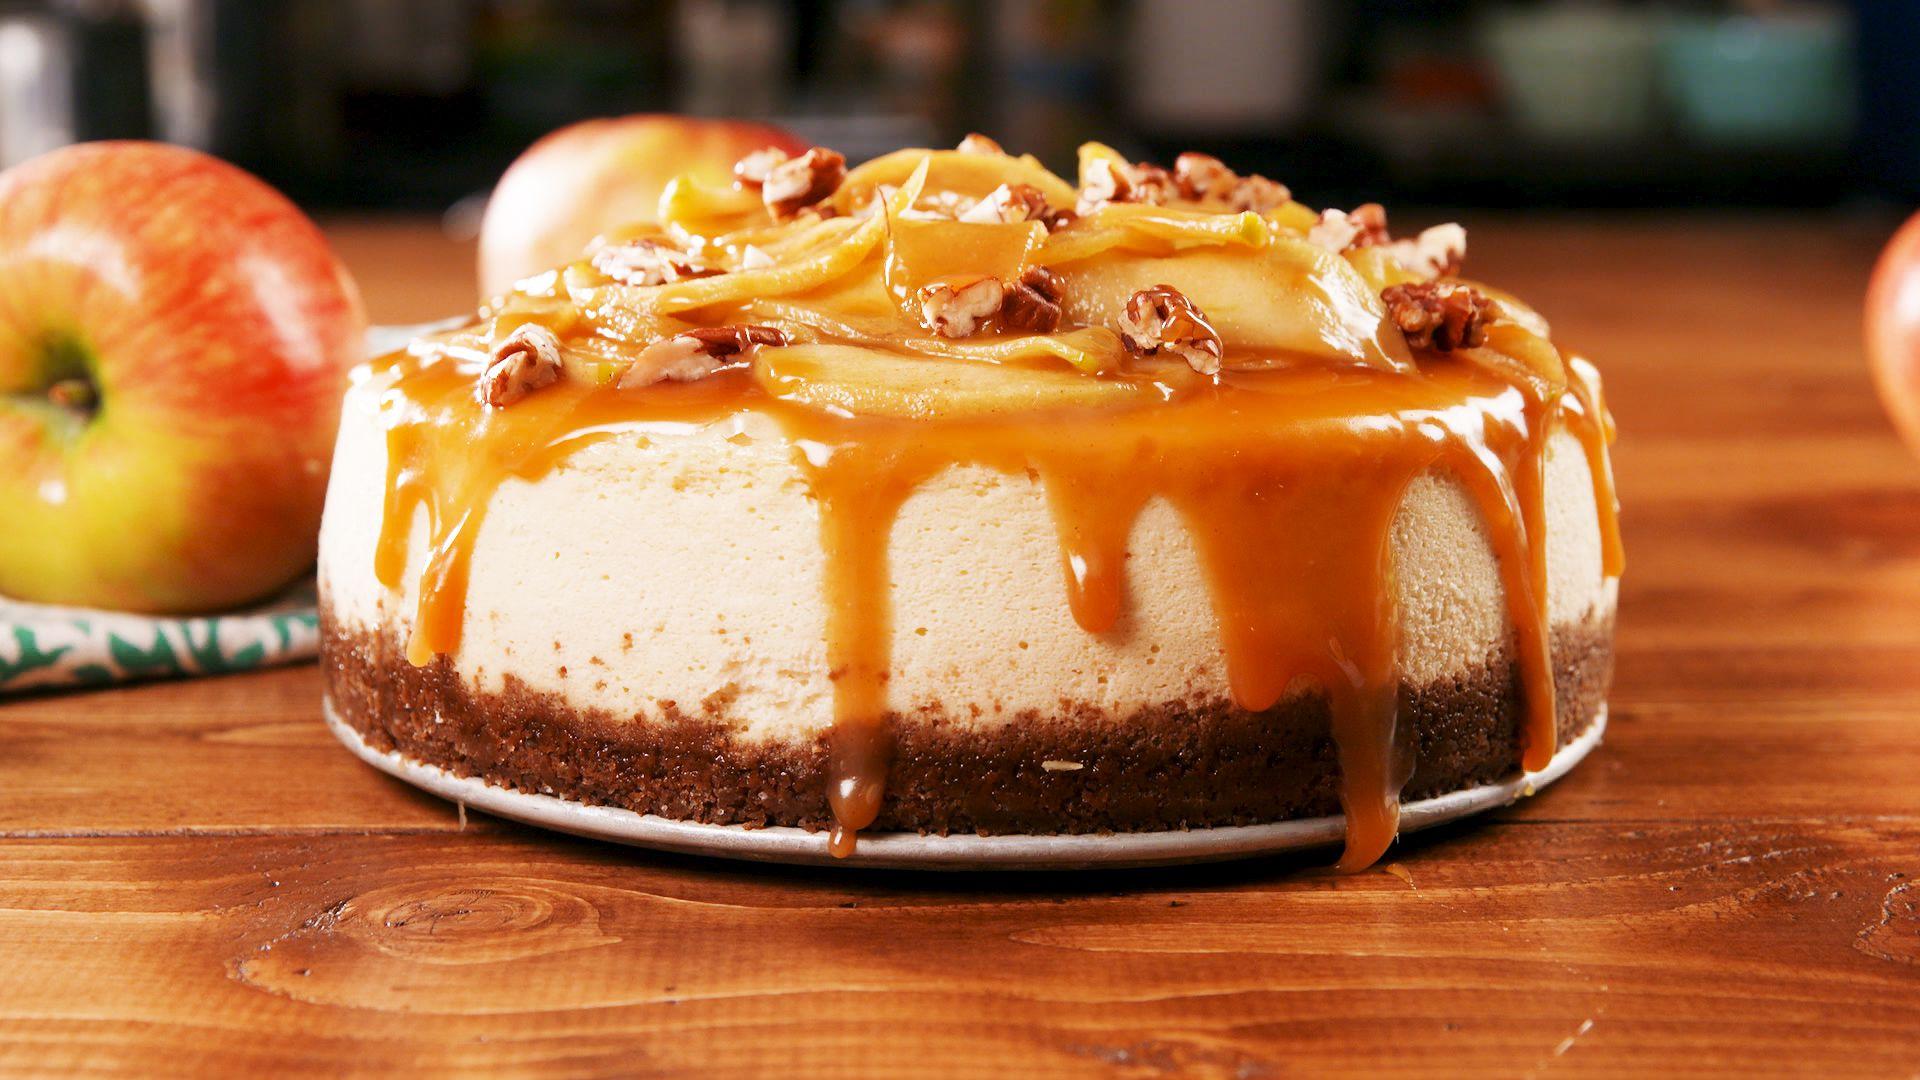 delish-caramel-apple-cheesecake-still002-1536860533